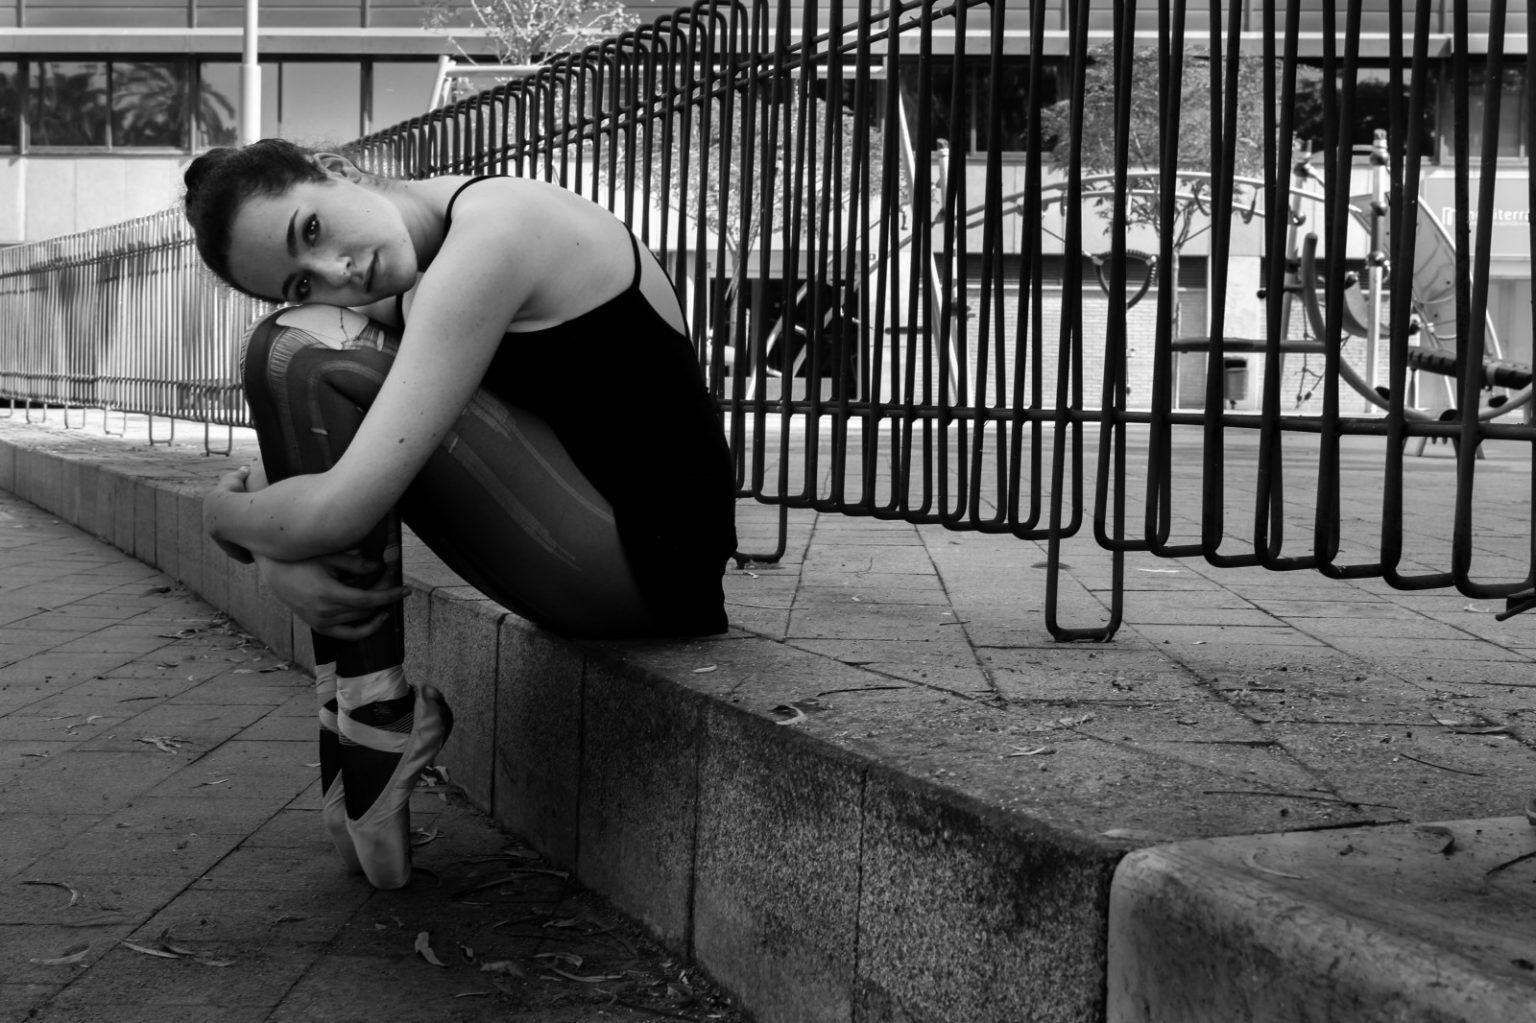 blackandwhite_bw_ballet_girl_canon_shoe_dance_ballerina-965194